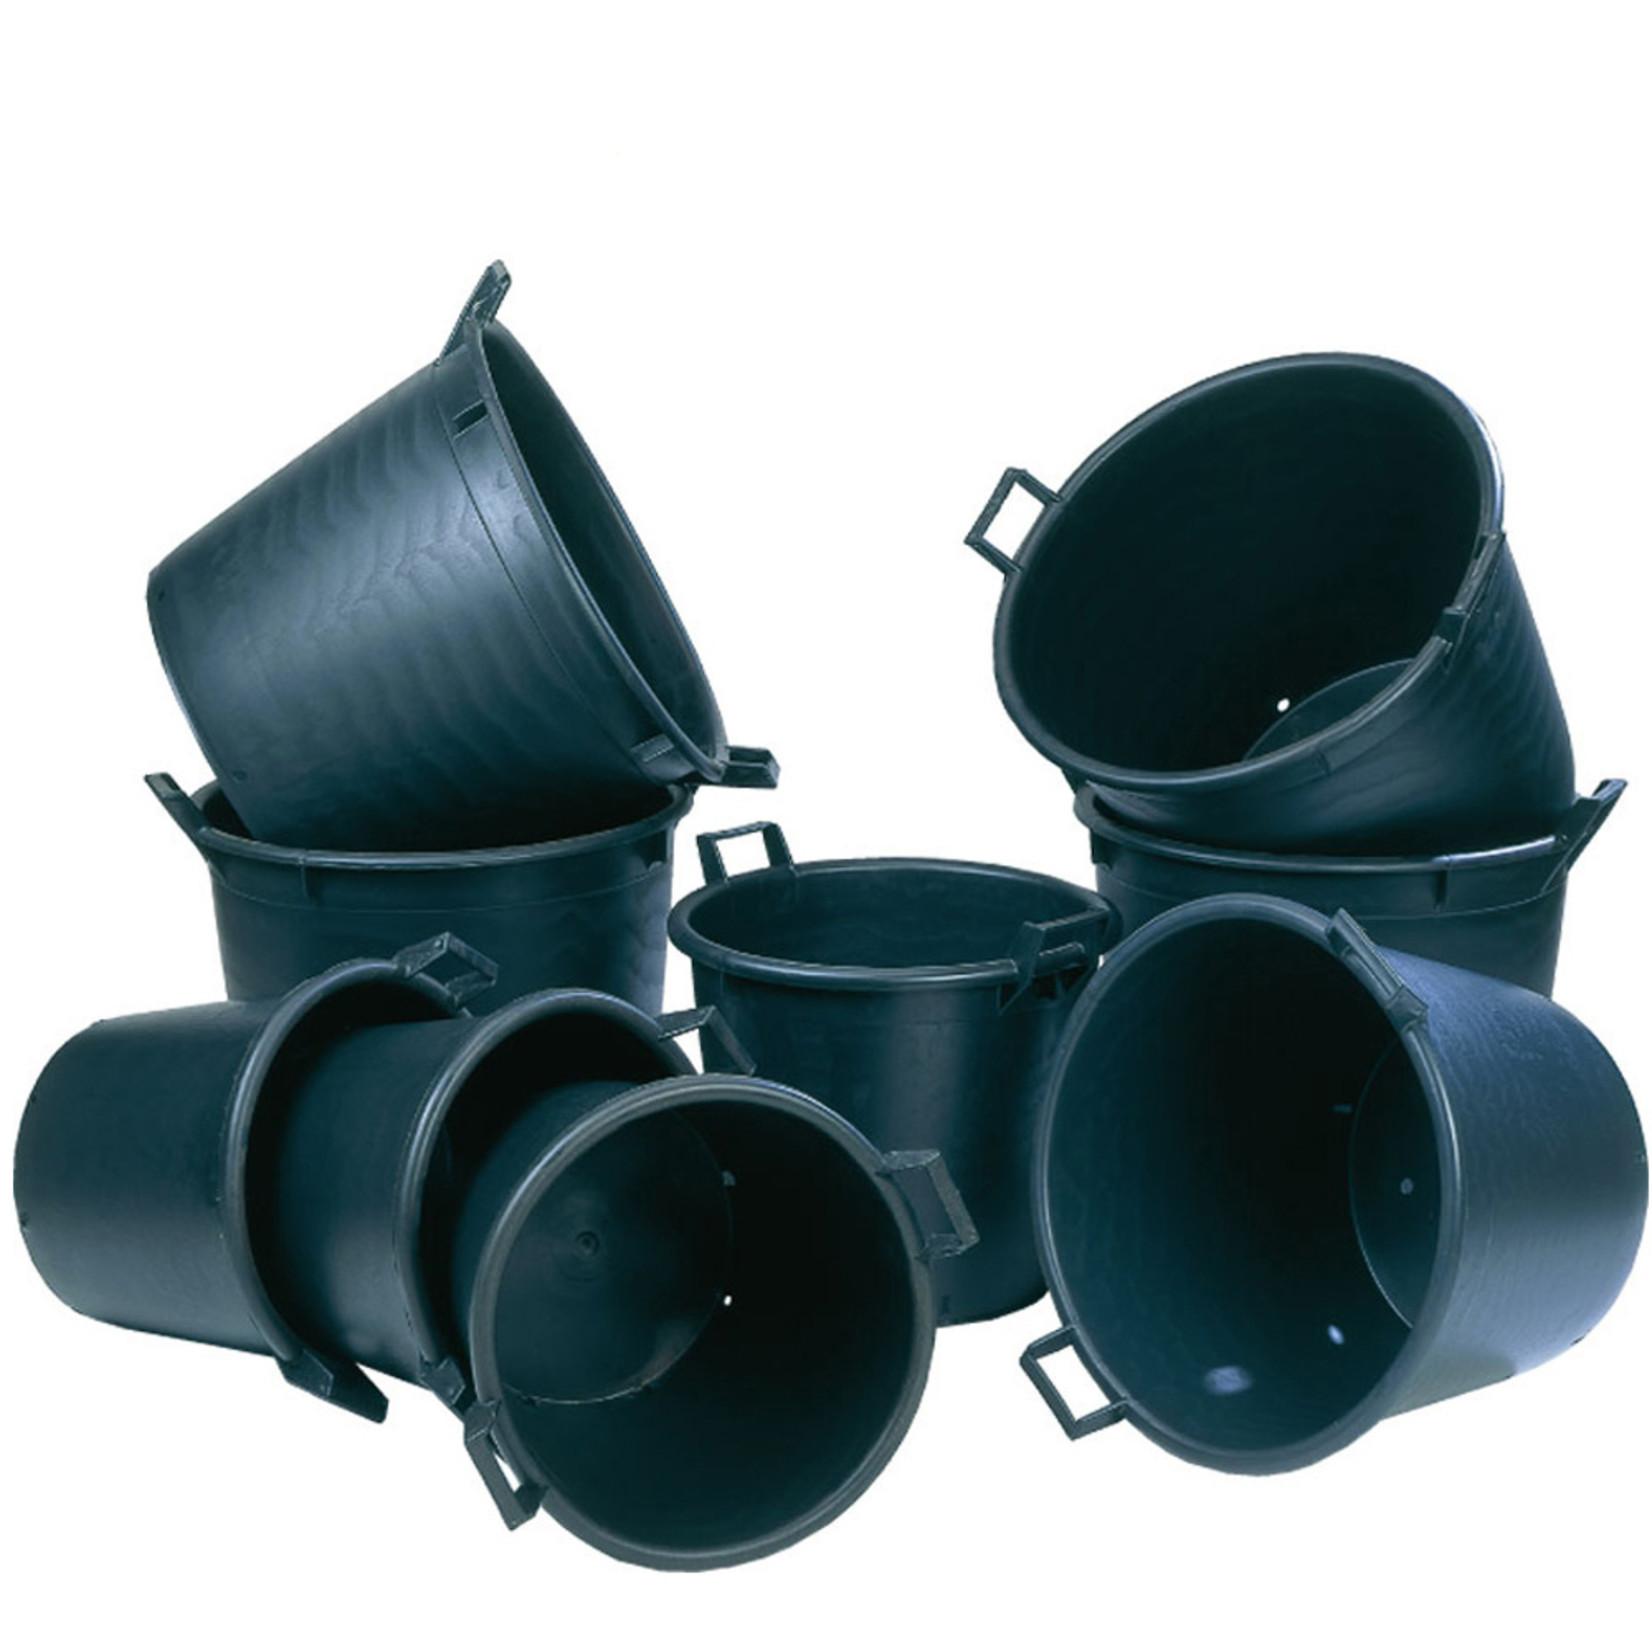 Boomkuip 110 liter Ø 71 x h.39 cm